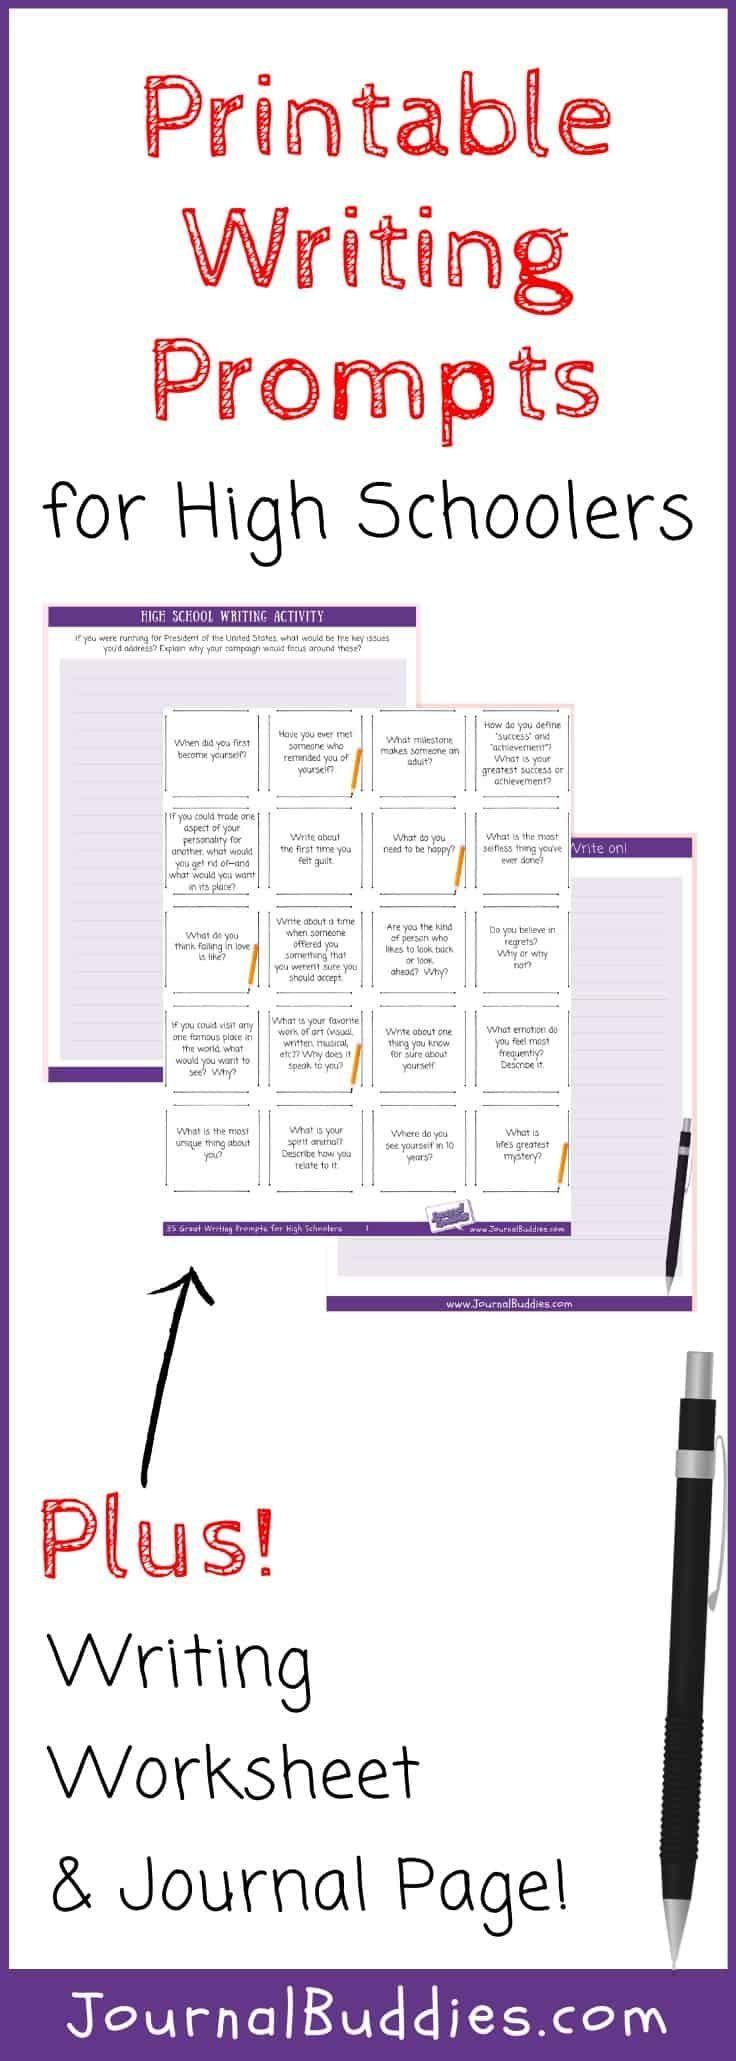 High School Writing Worksheets High School Writing Writing Worksheets Printable Writing Prompts [ 2061 x 736 Pixel ]